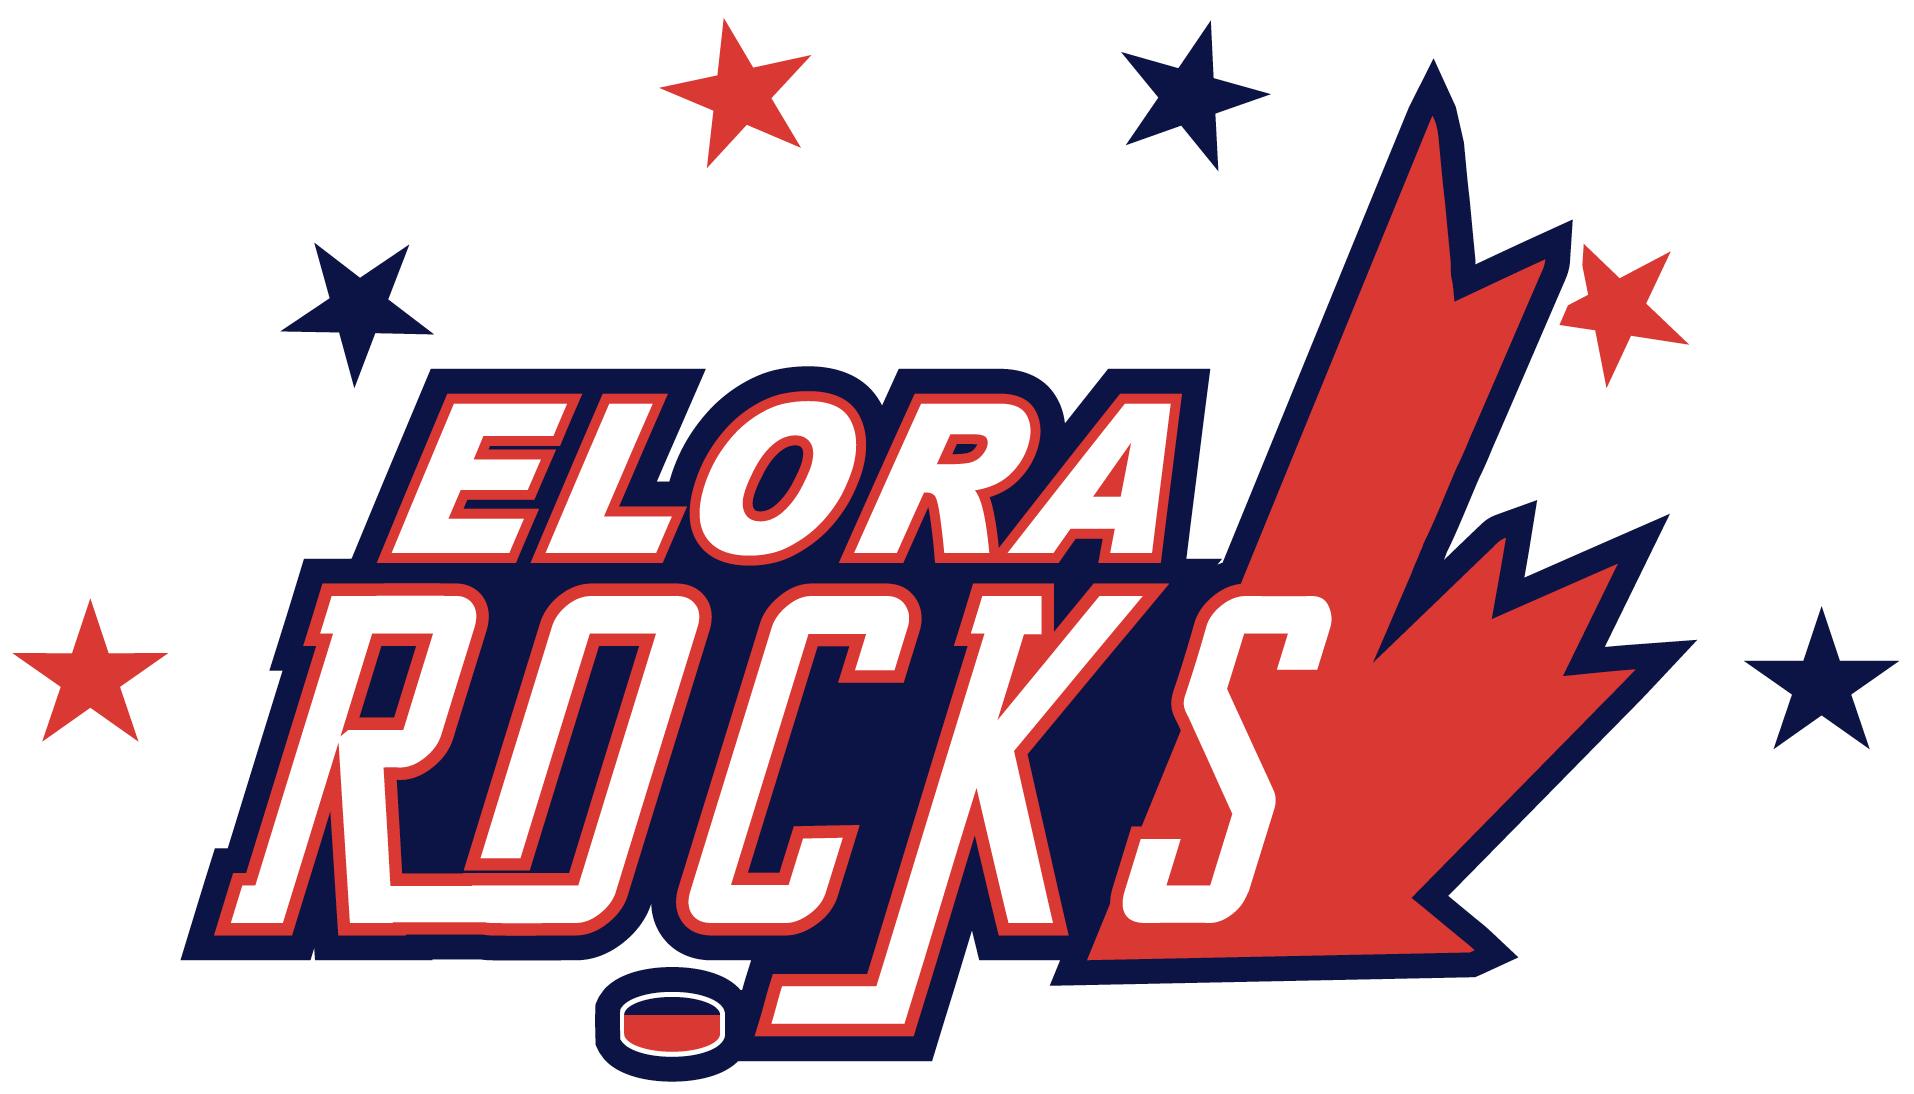 Elora Rocks Single Game Tickets